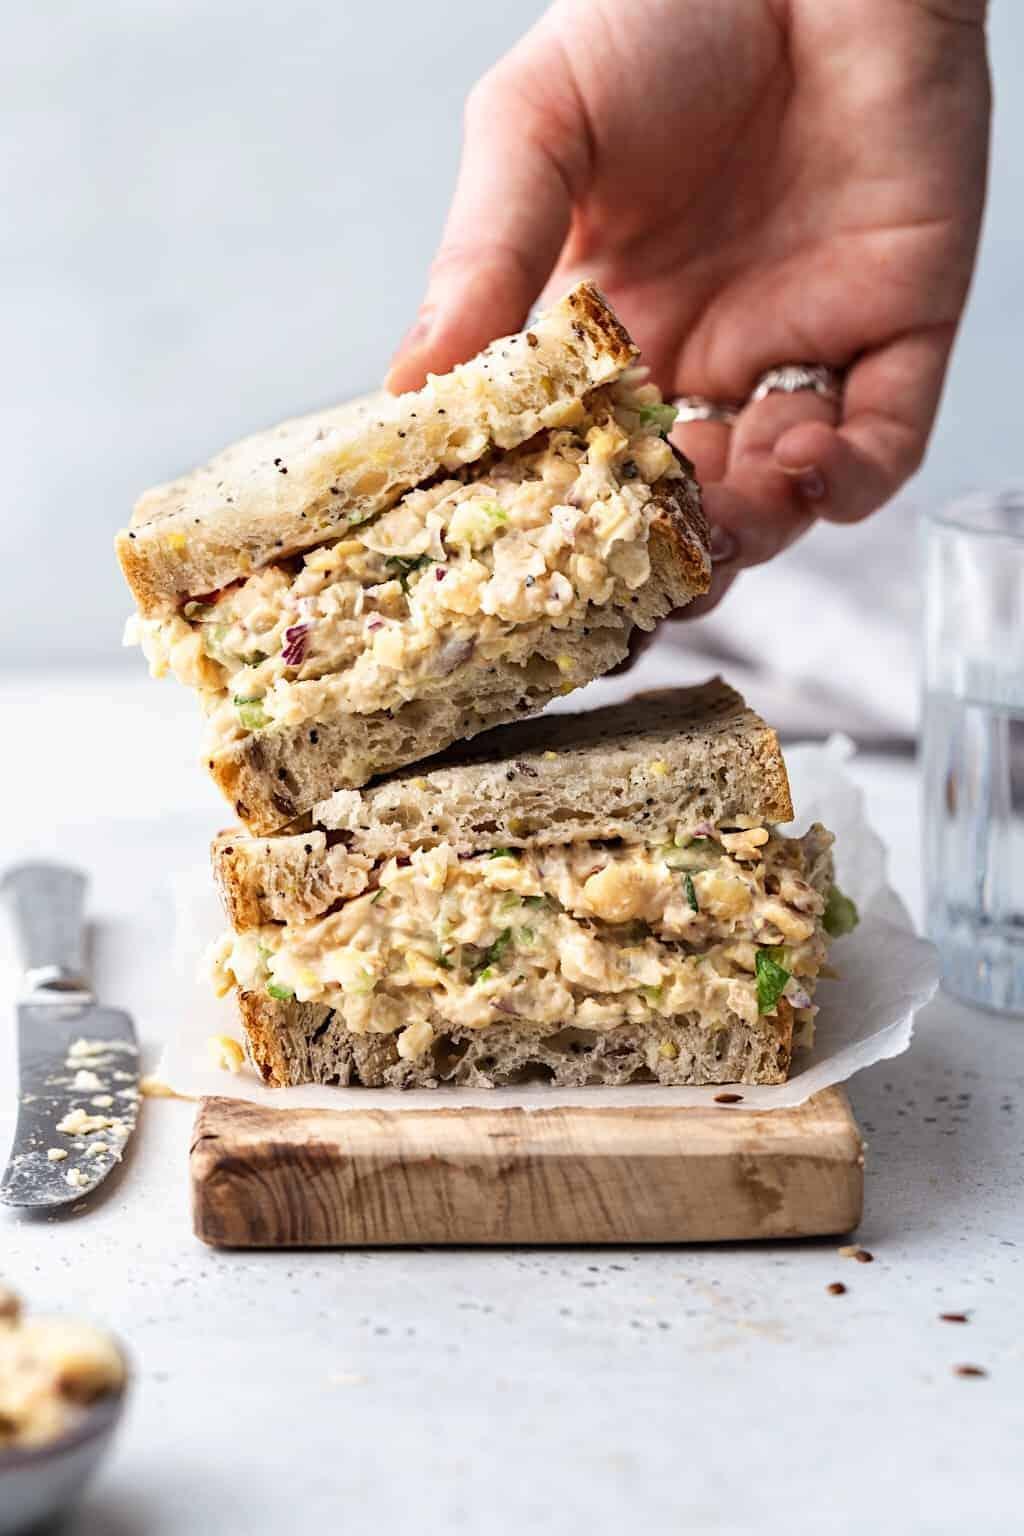 Vegan Chickpea Tuna Mayo #chickpea #salad #dairyfree #plantbased #mayo